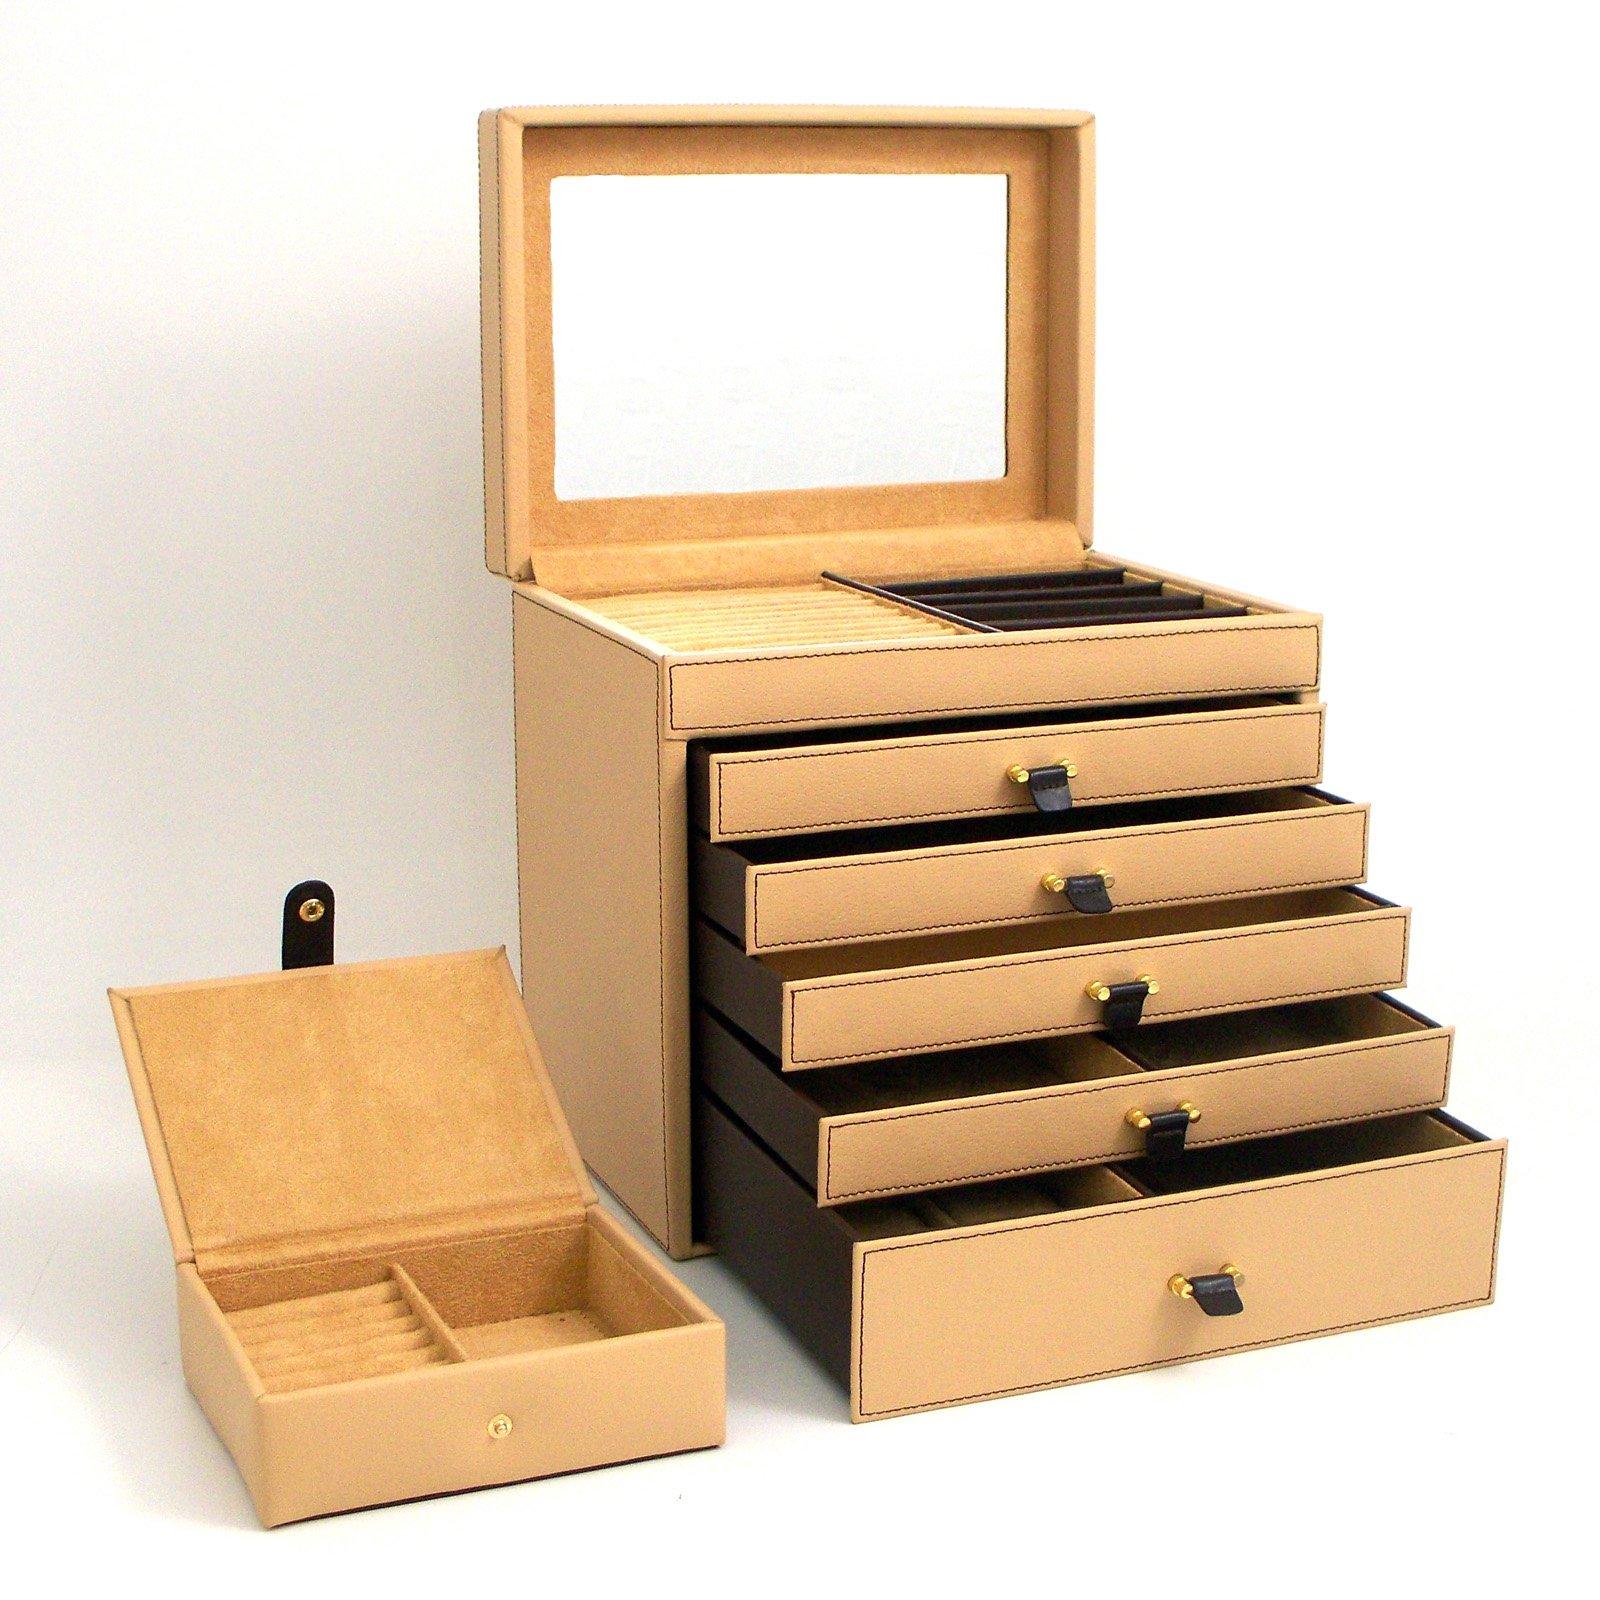 Tan Leather Jewelry Box 11w X 11h In Leather Jewelry Box